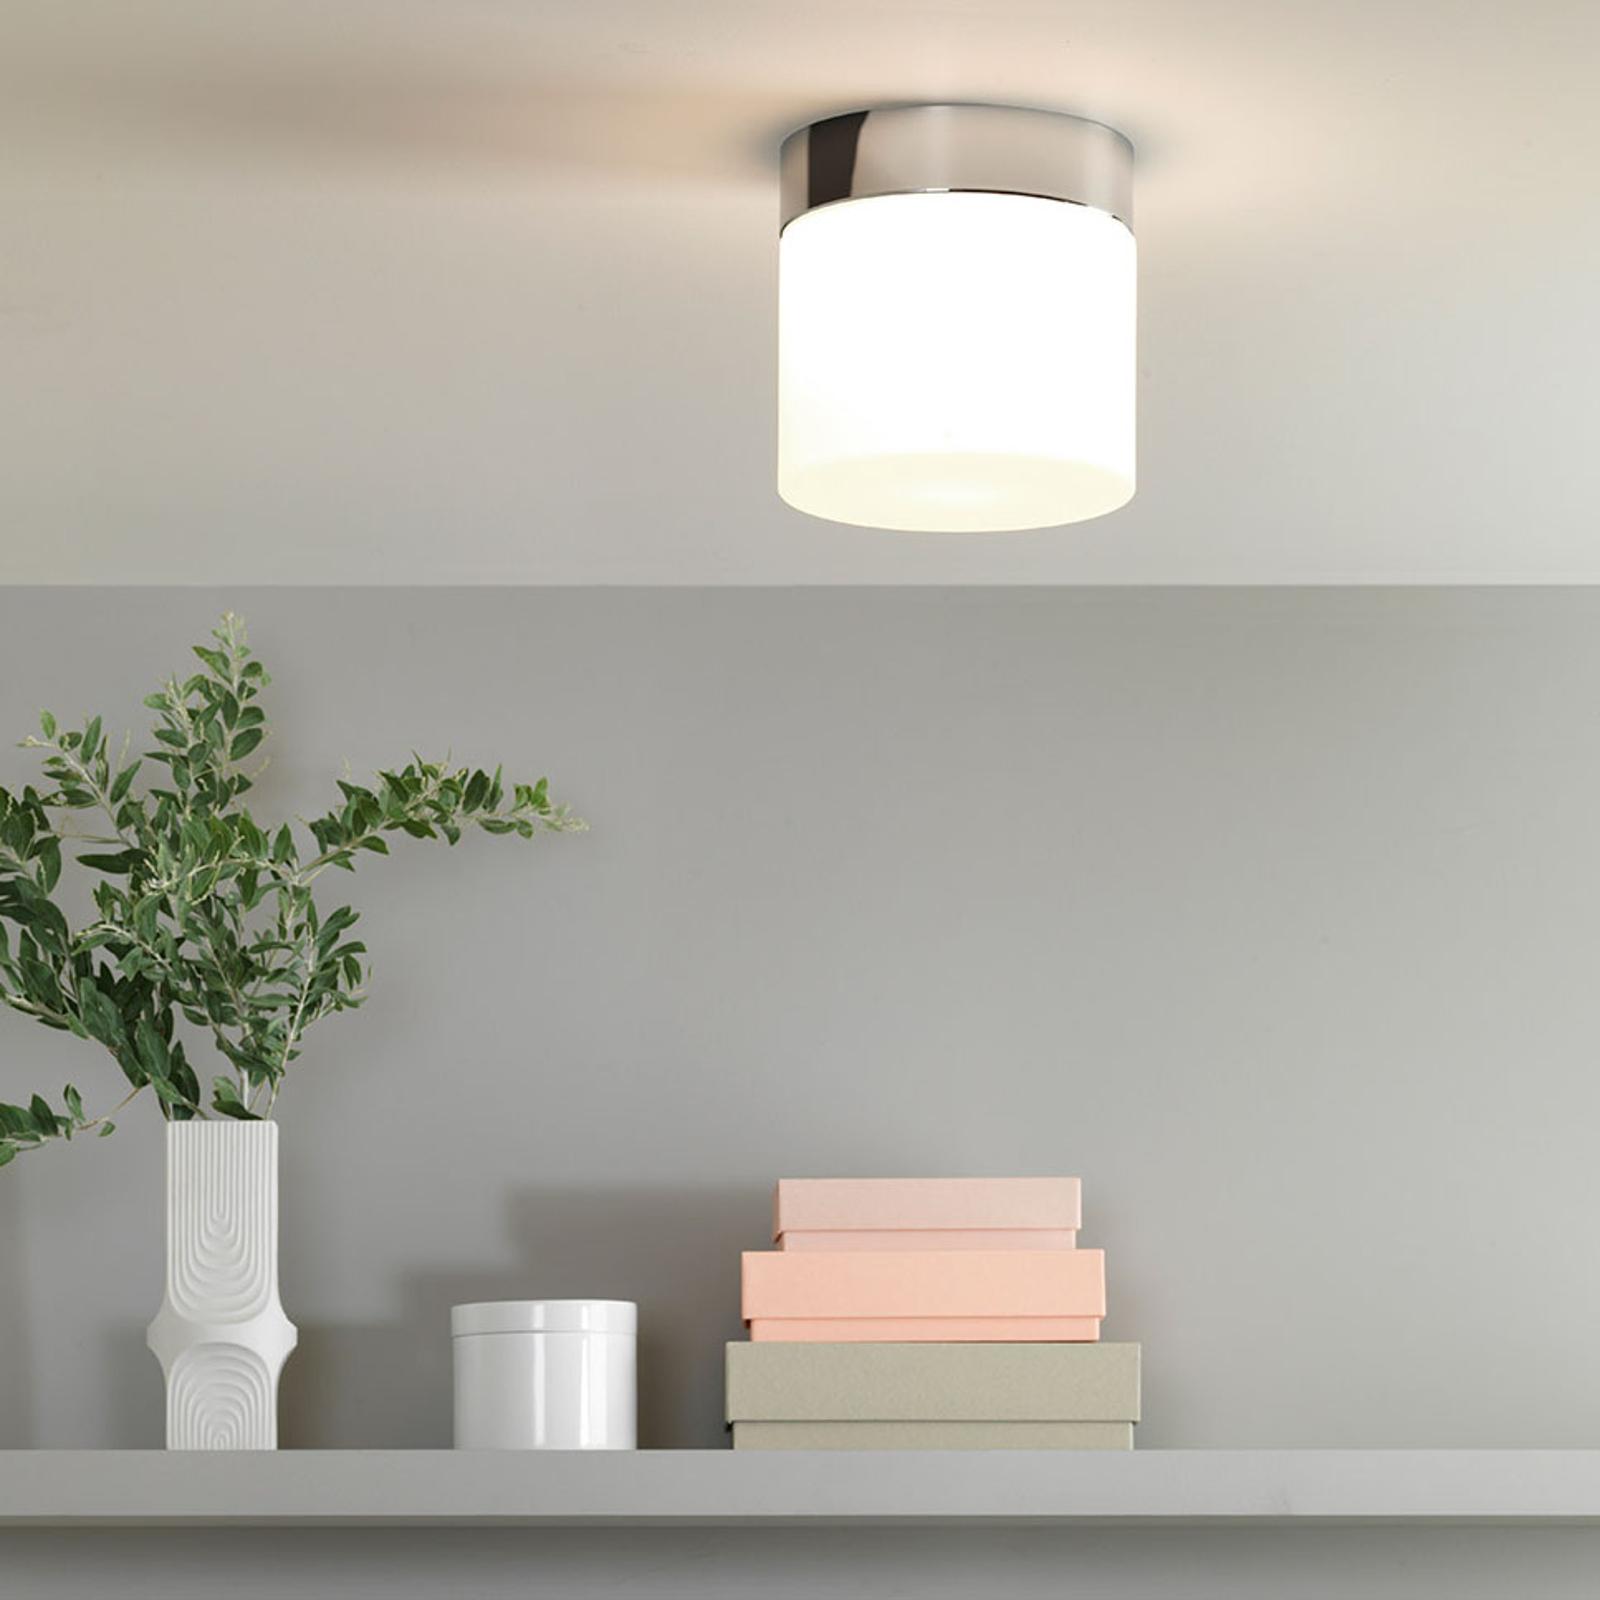 Helder stralende plafondlamp SABINA